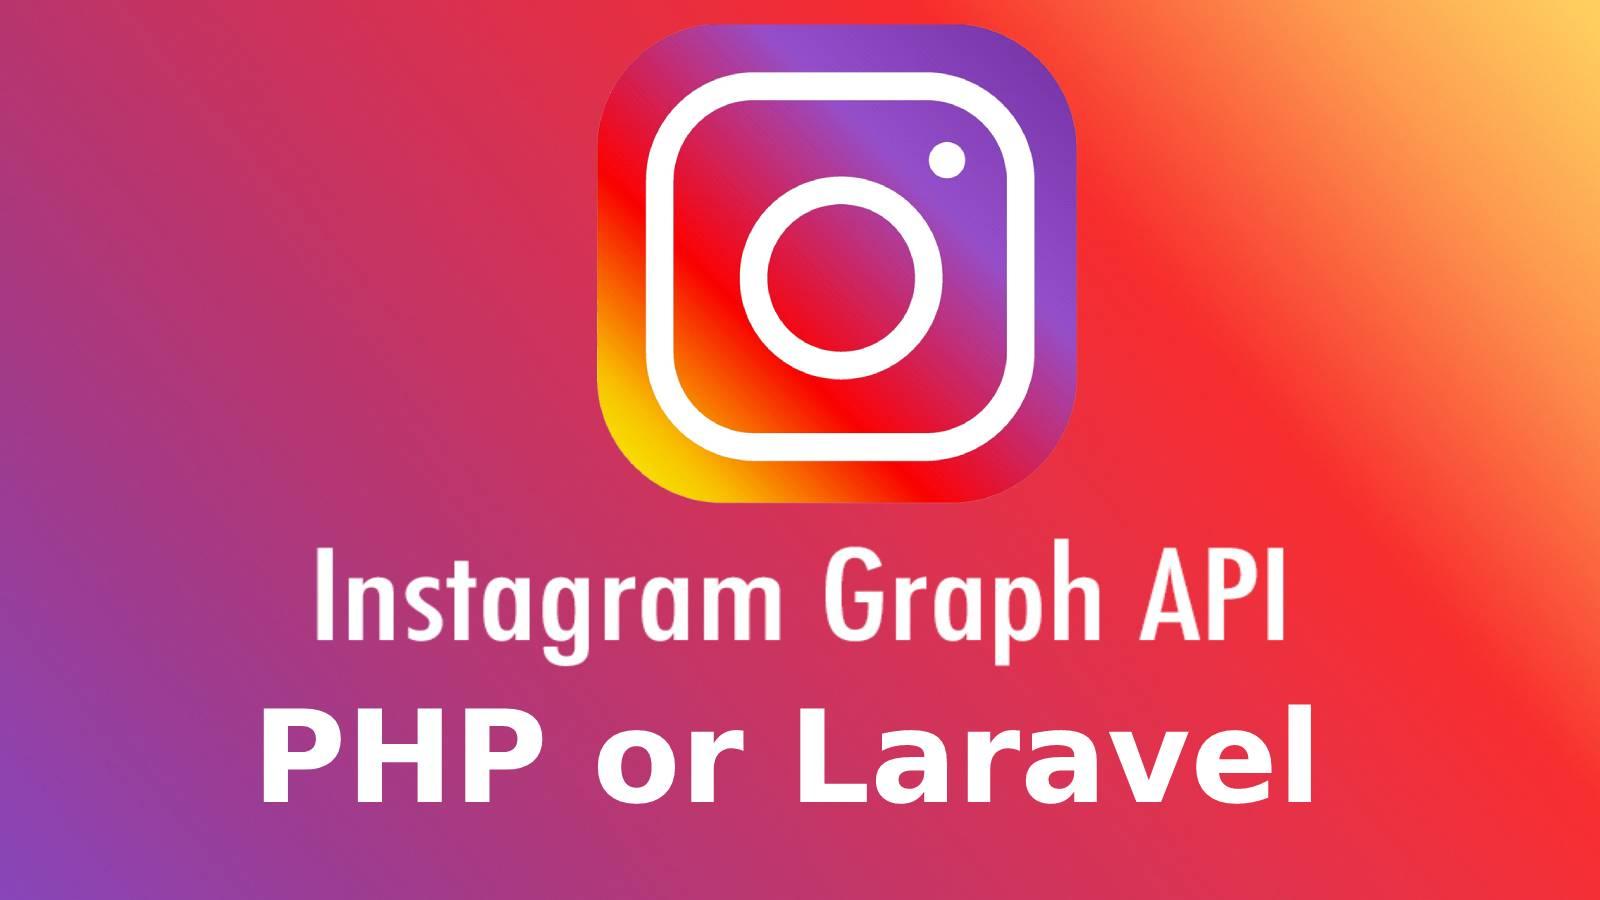 Integrating Instagram Graph API in PHP or Laravel